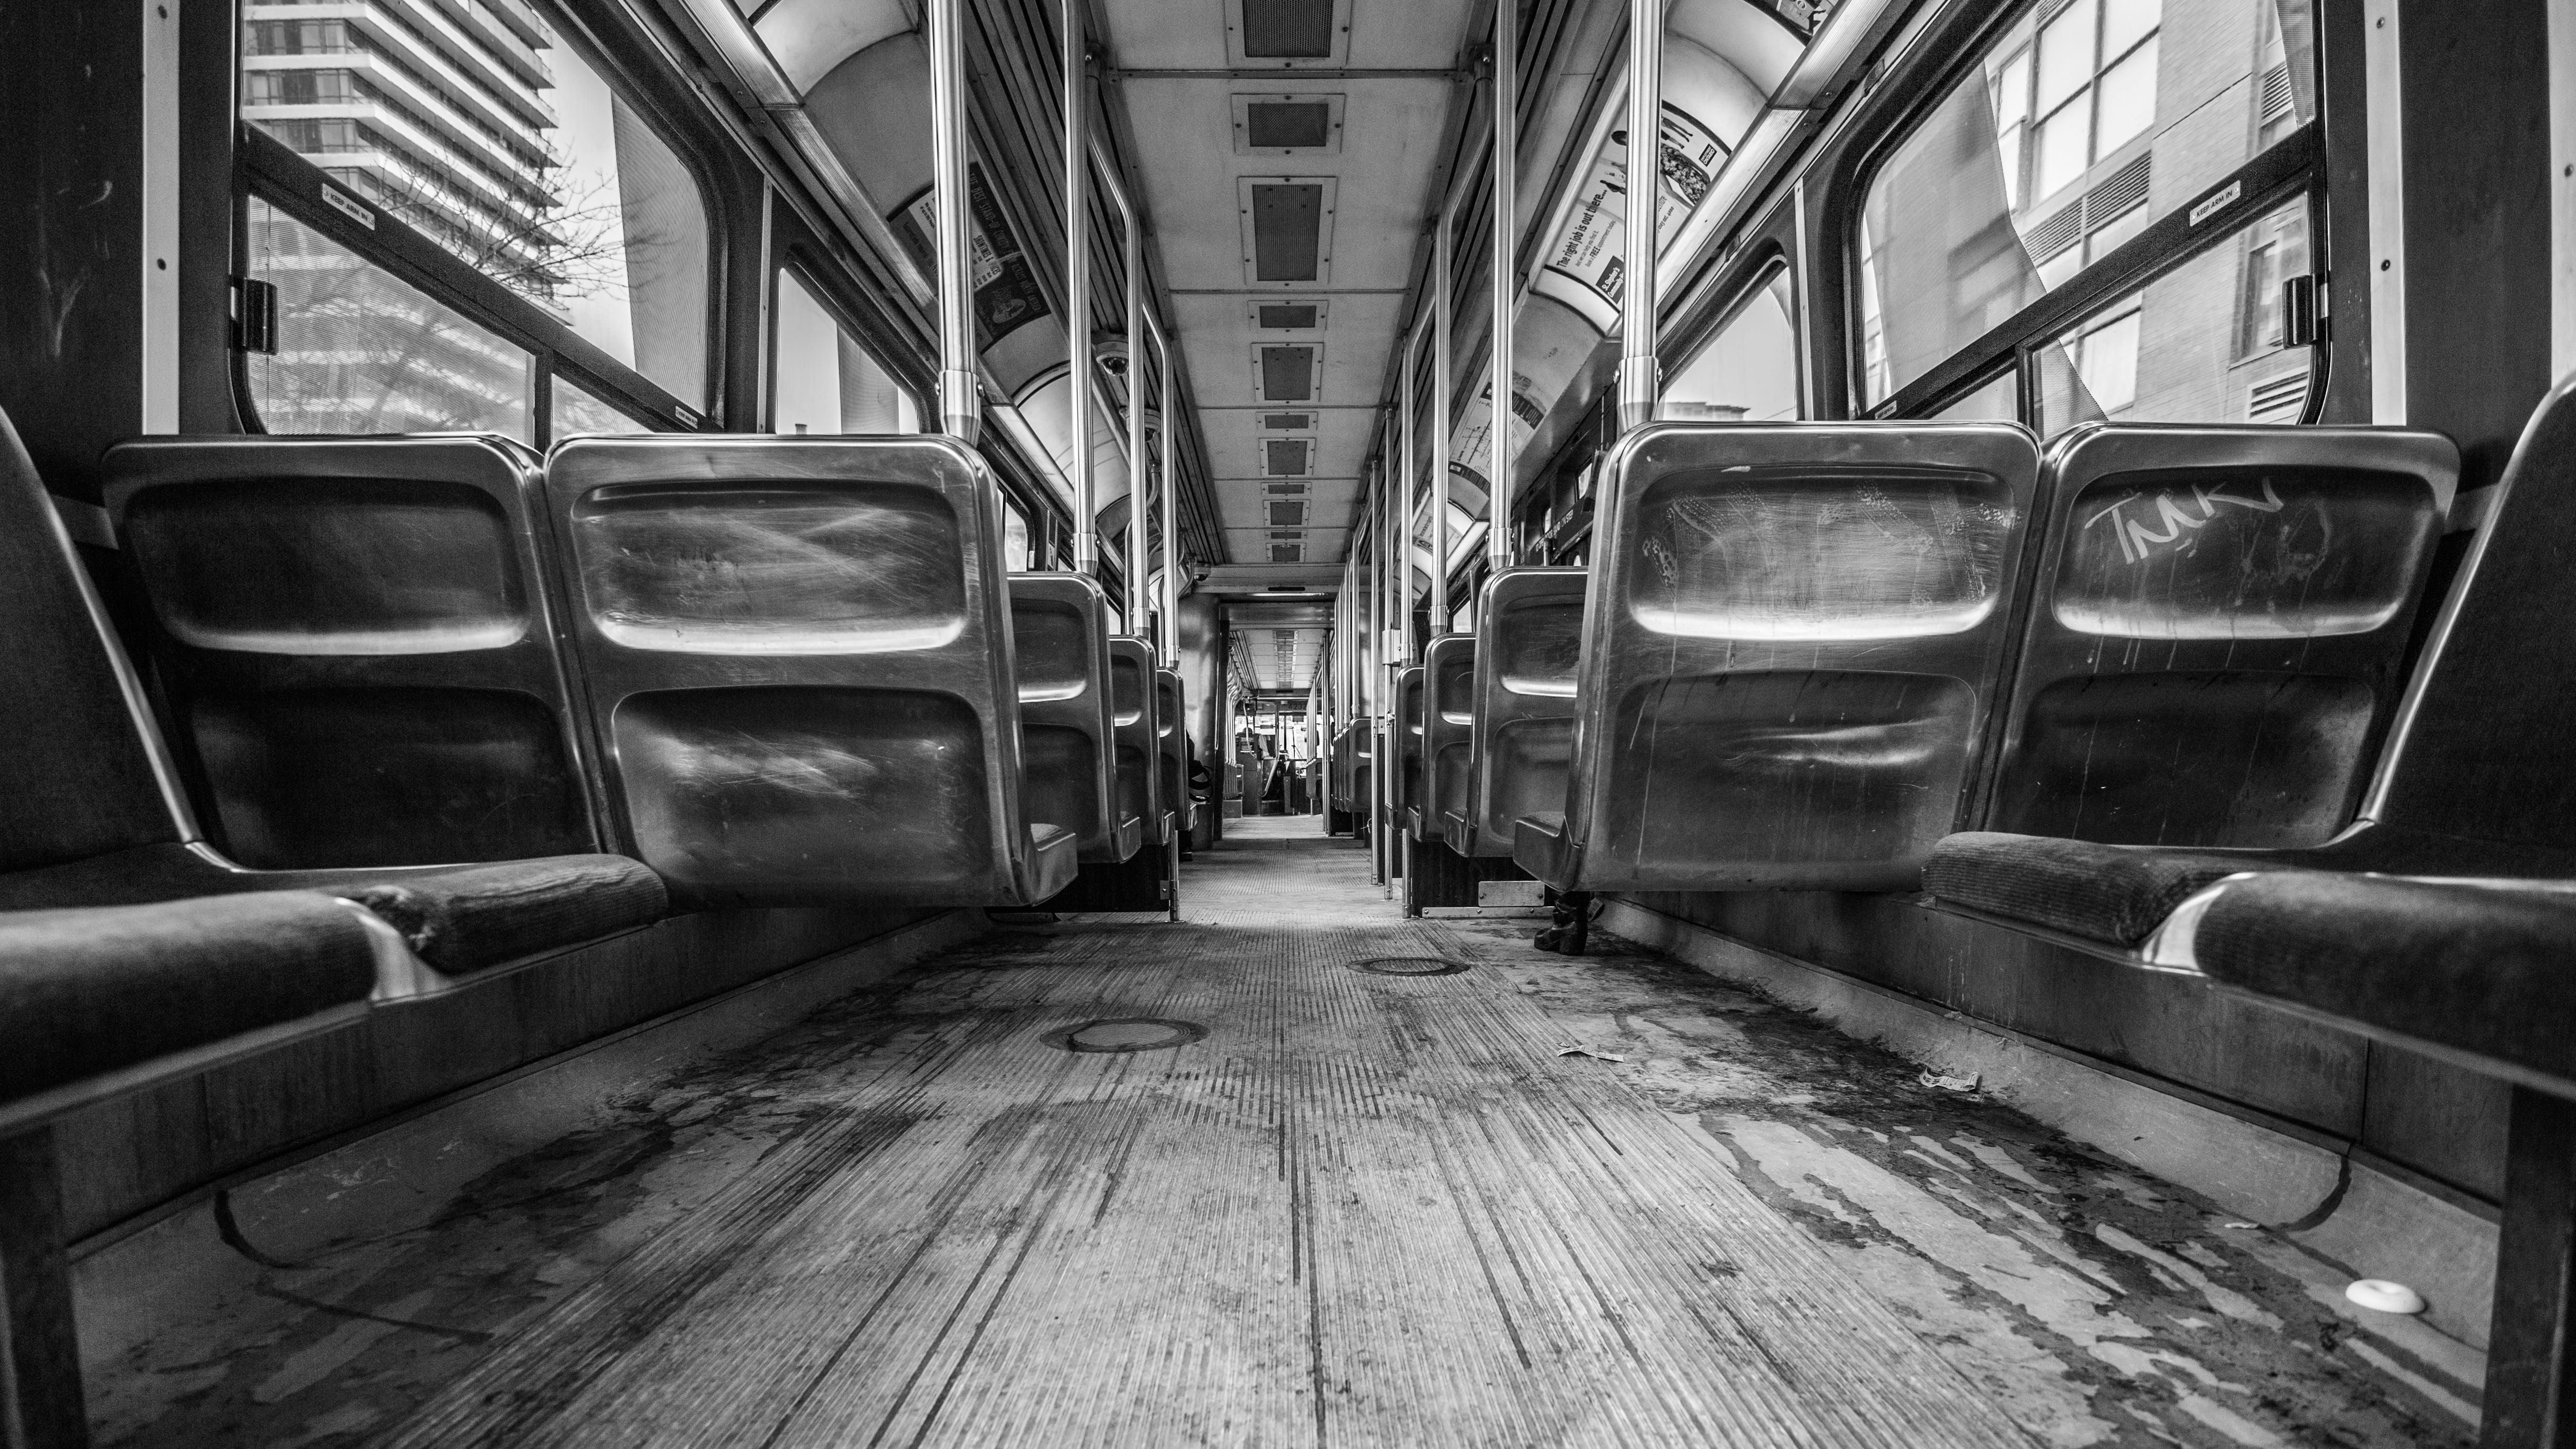 Inside the train illustration in grayscale HD wallpaper   Wallpaper ...